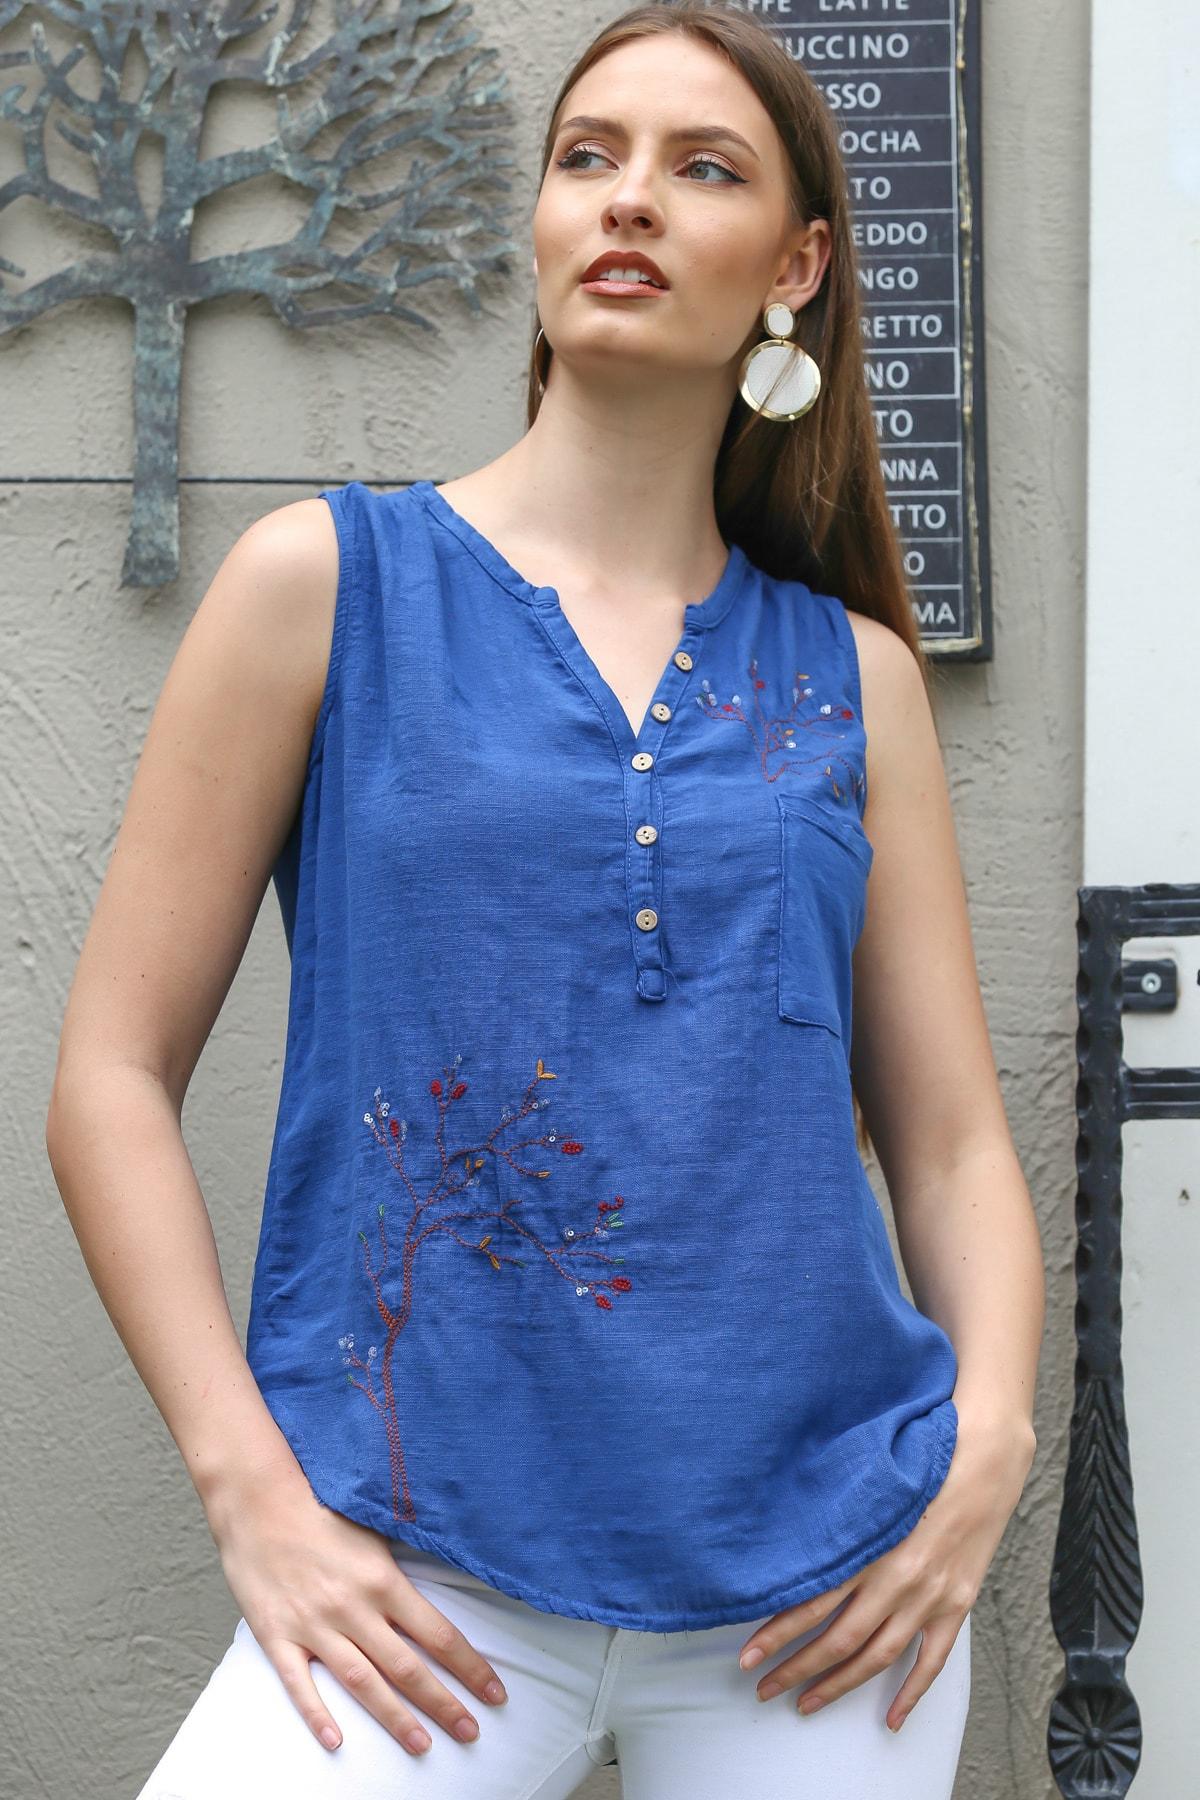 Kadın Mavi Patı Düğme Detaylı Ağaç Nakışlı Kolsuz Dokuma Bluz M10010200BL95303